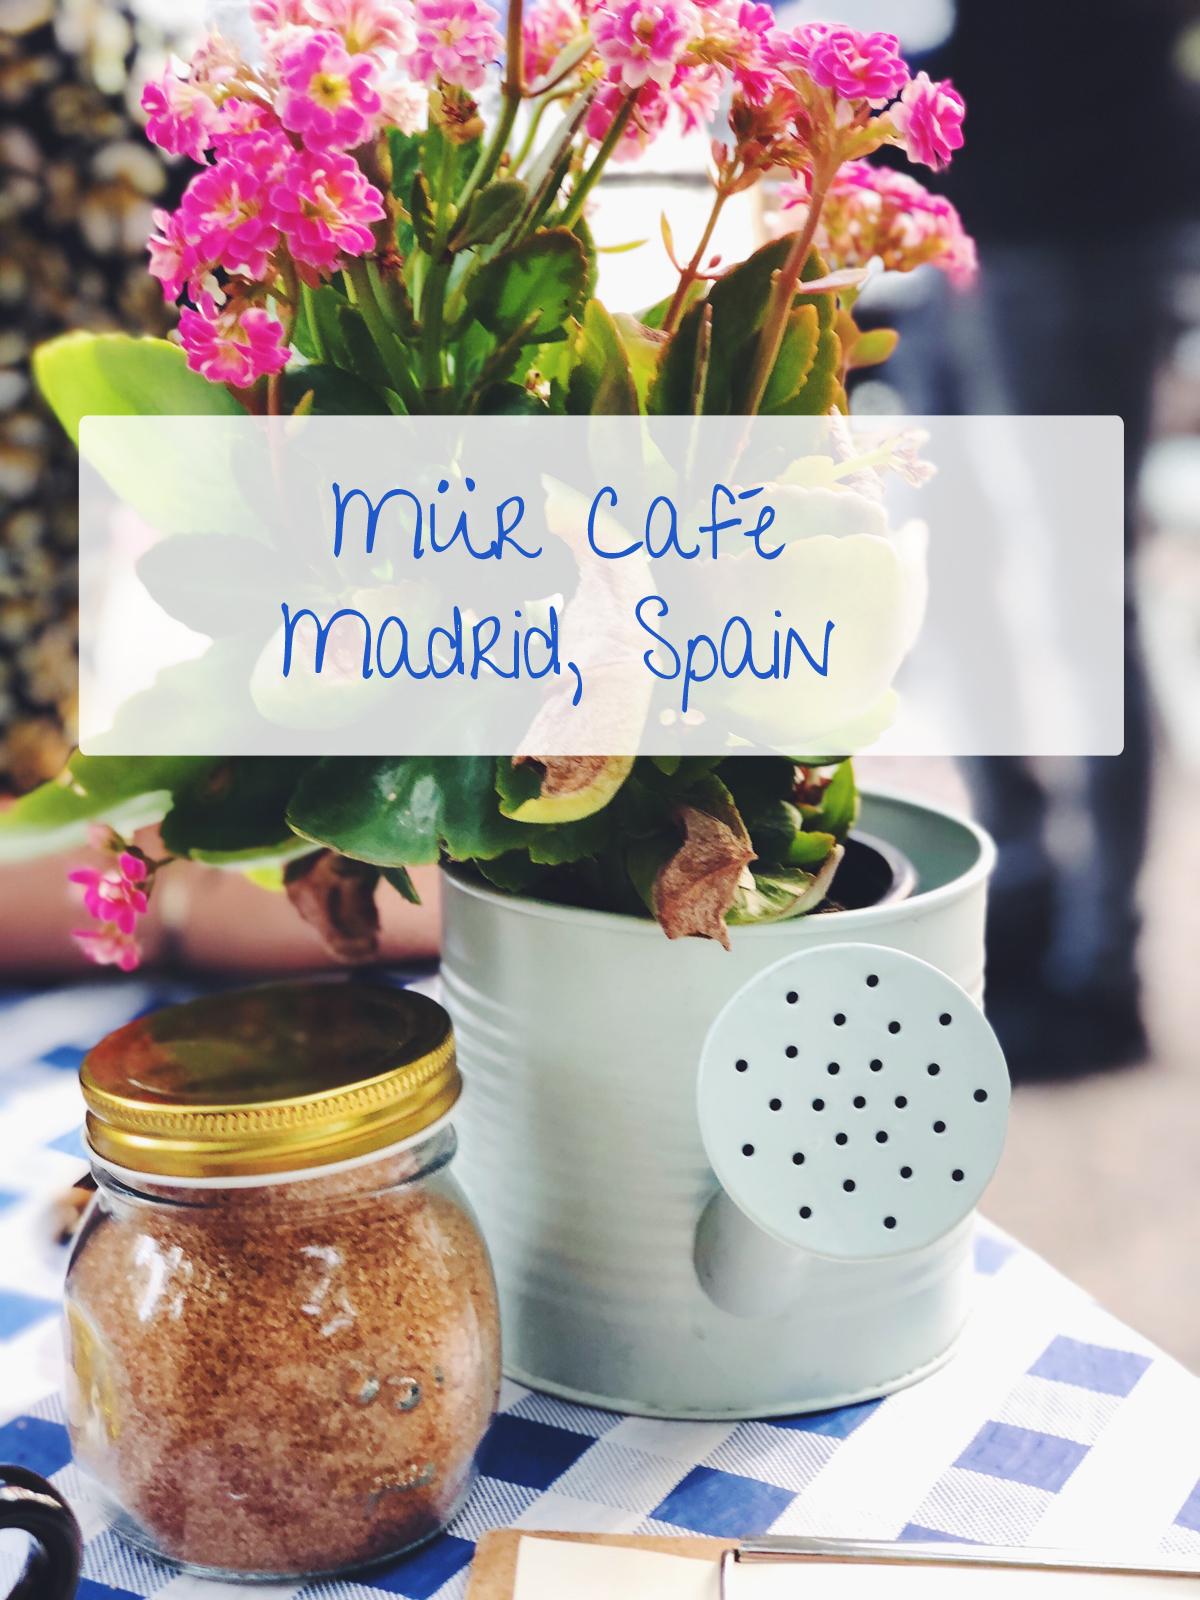 Mür Café Madrid Spain espresso coffee